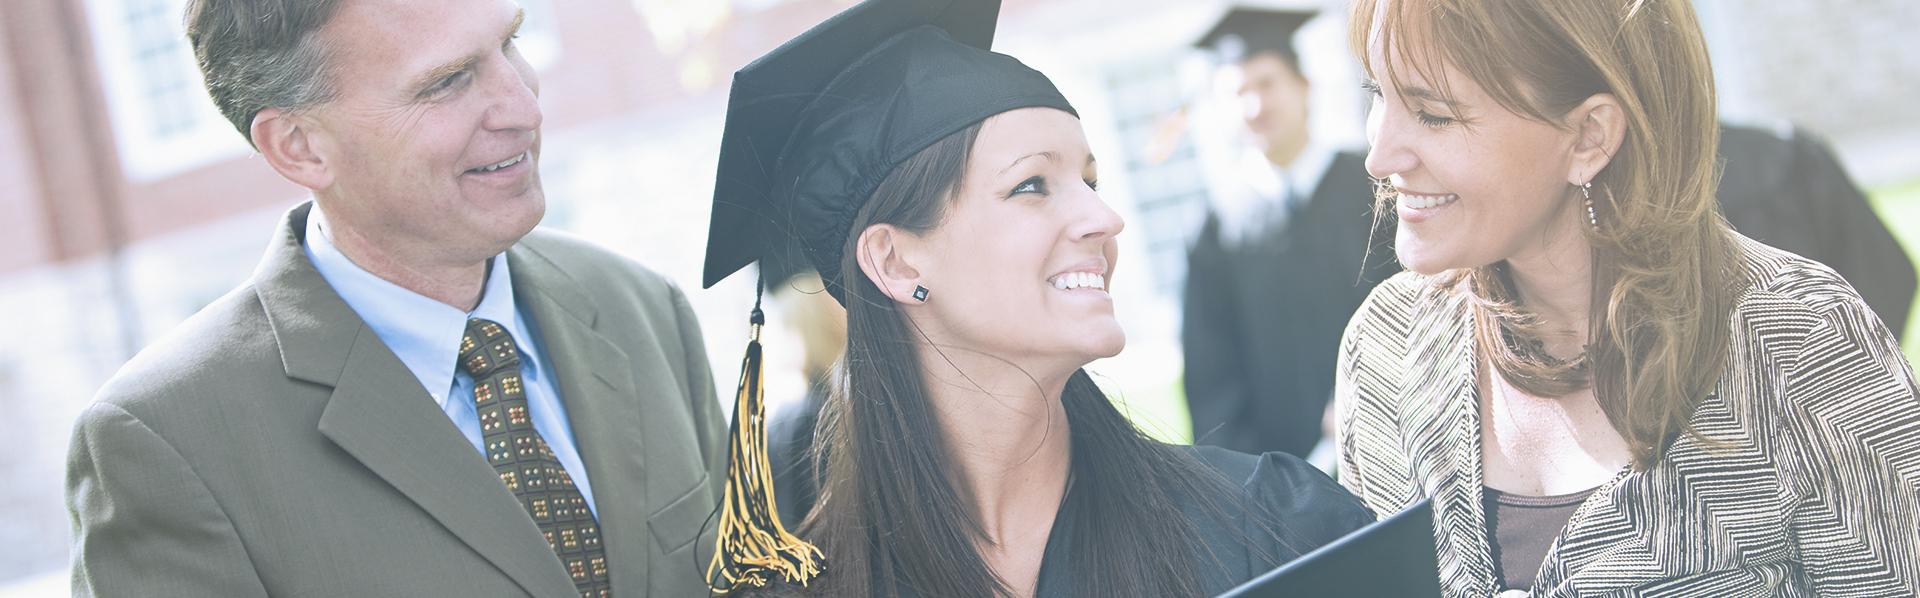 Università all'estero - EduPlacements